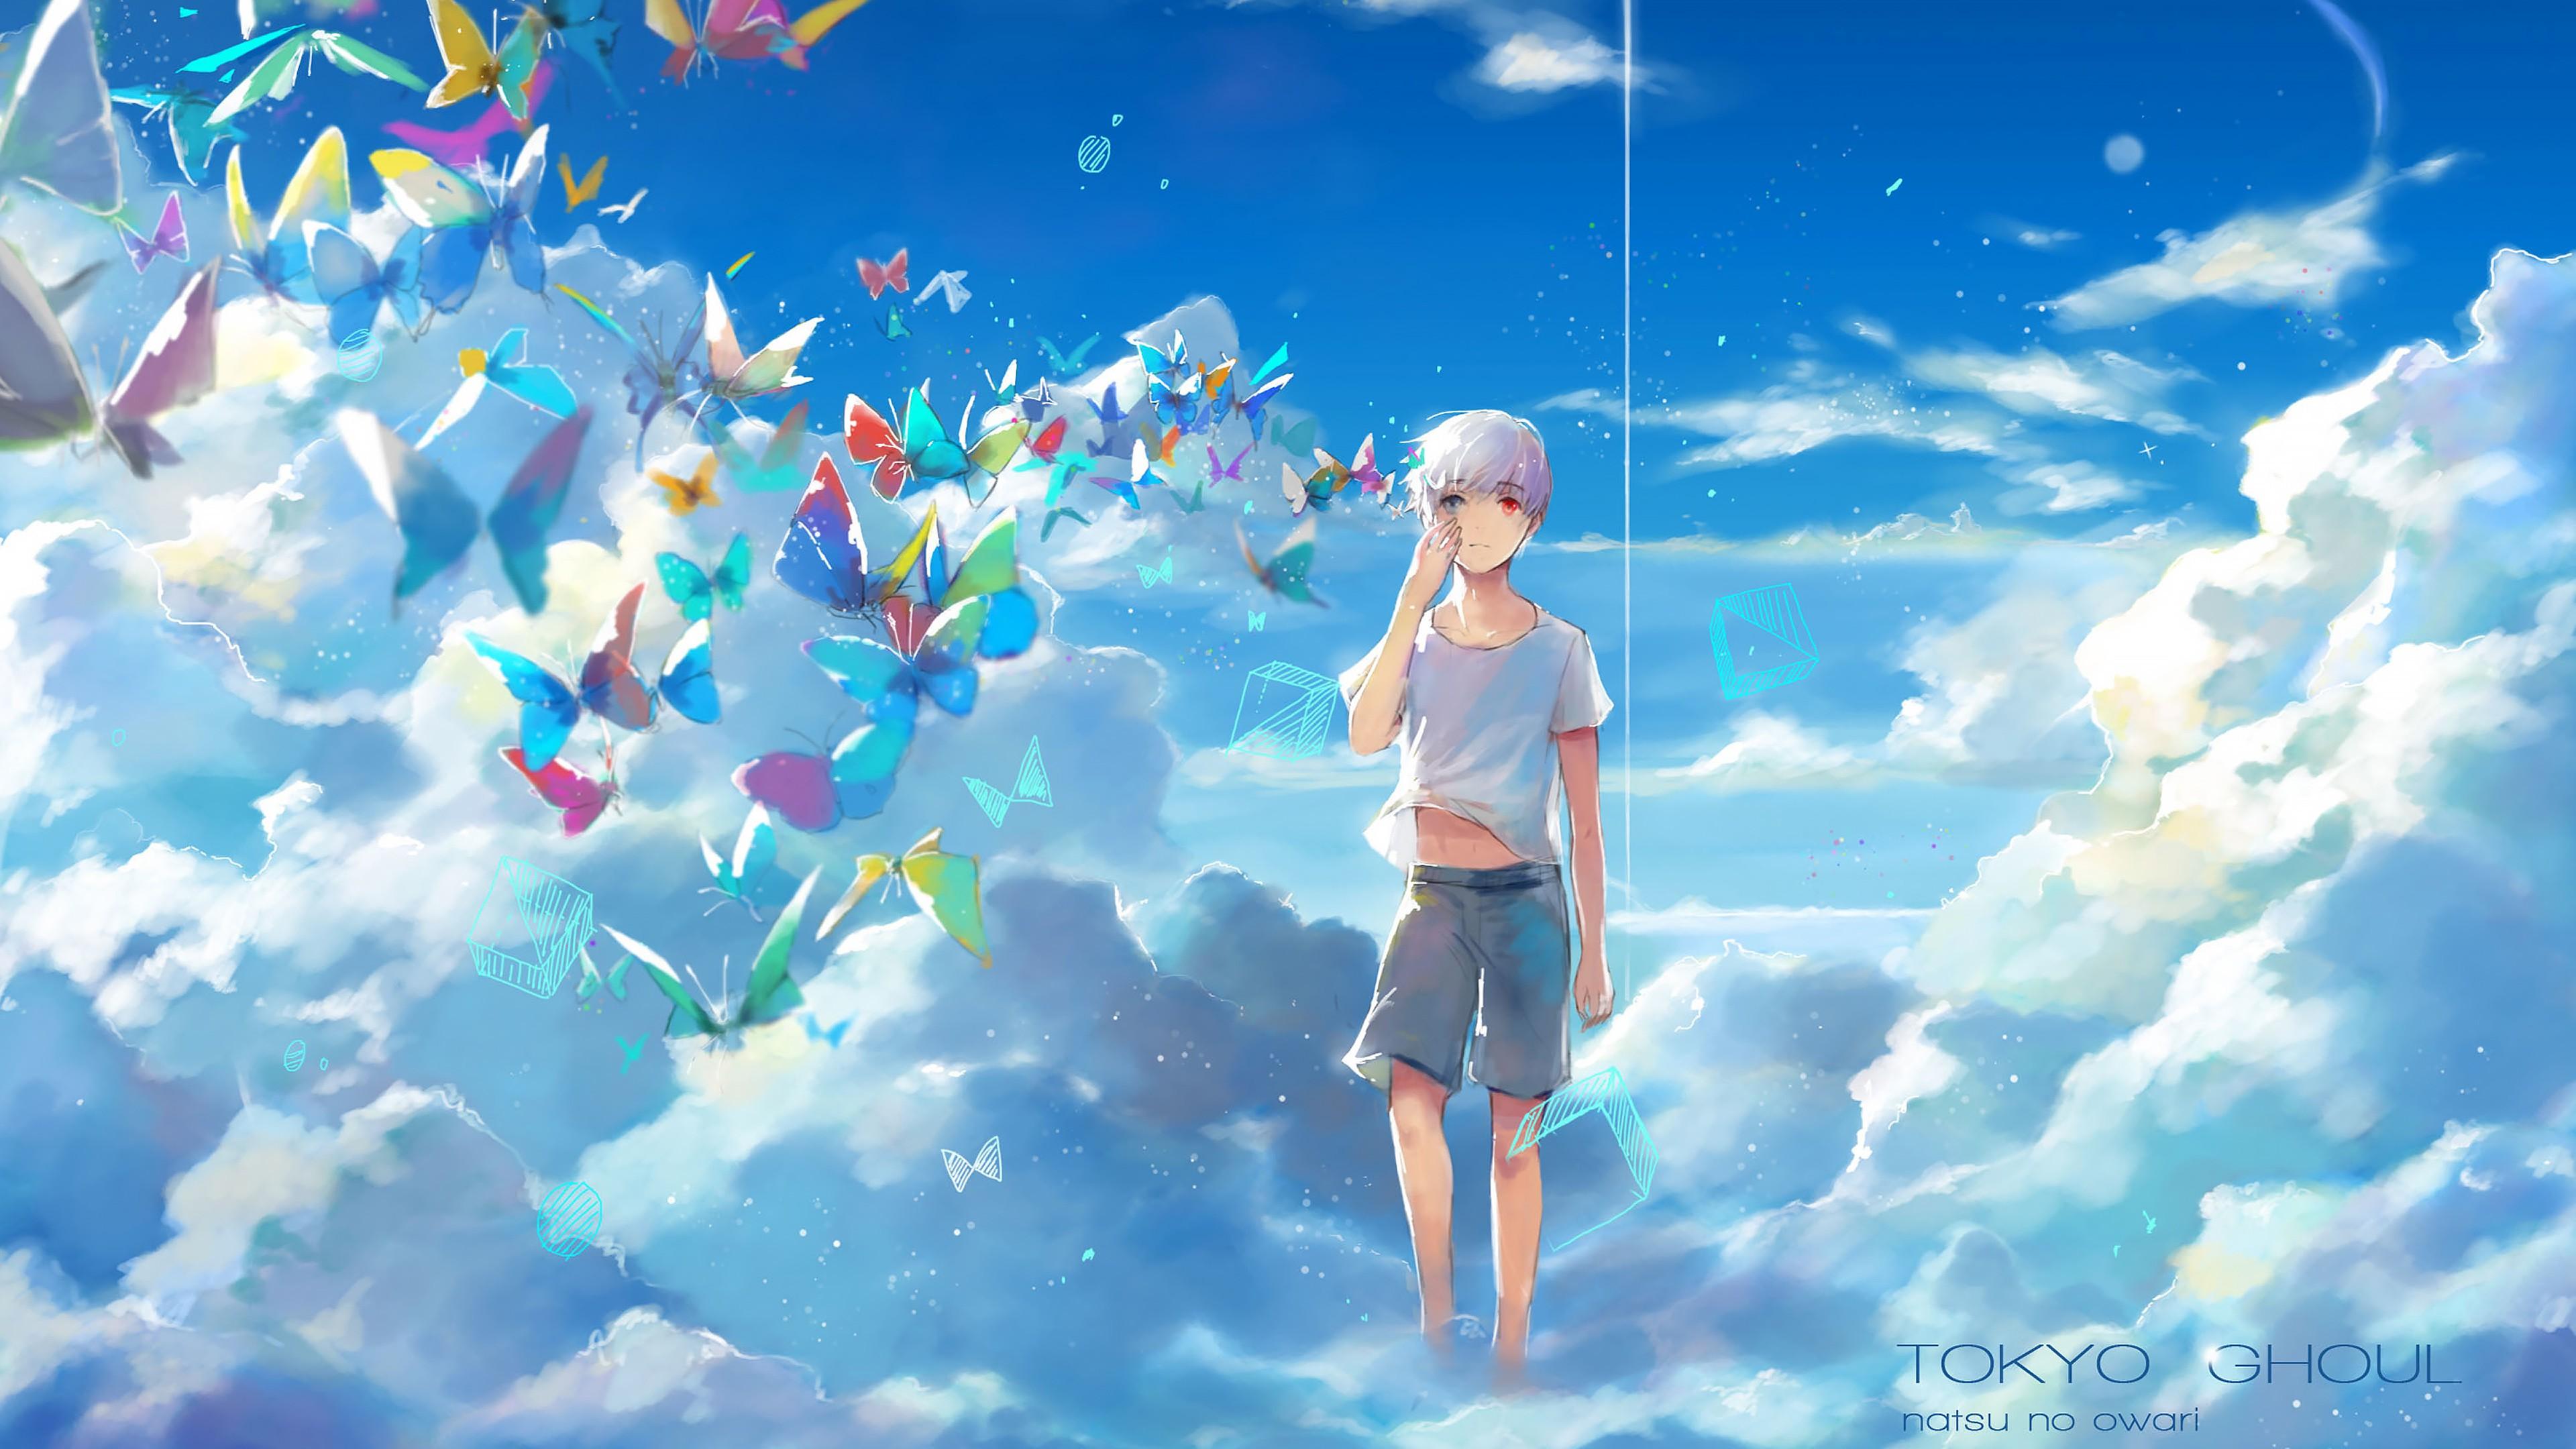 Sunlight Illustration Anime Boys Sky Clouds Butterfly Blue Heterochromia Kaneki Ken Tokyo Ghoul Cloud Screenshot